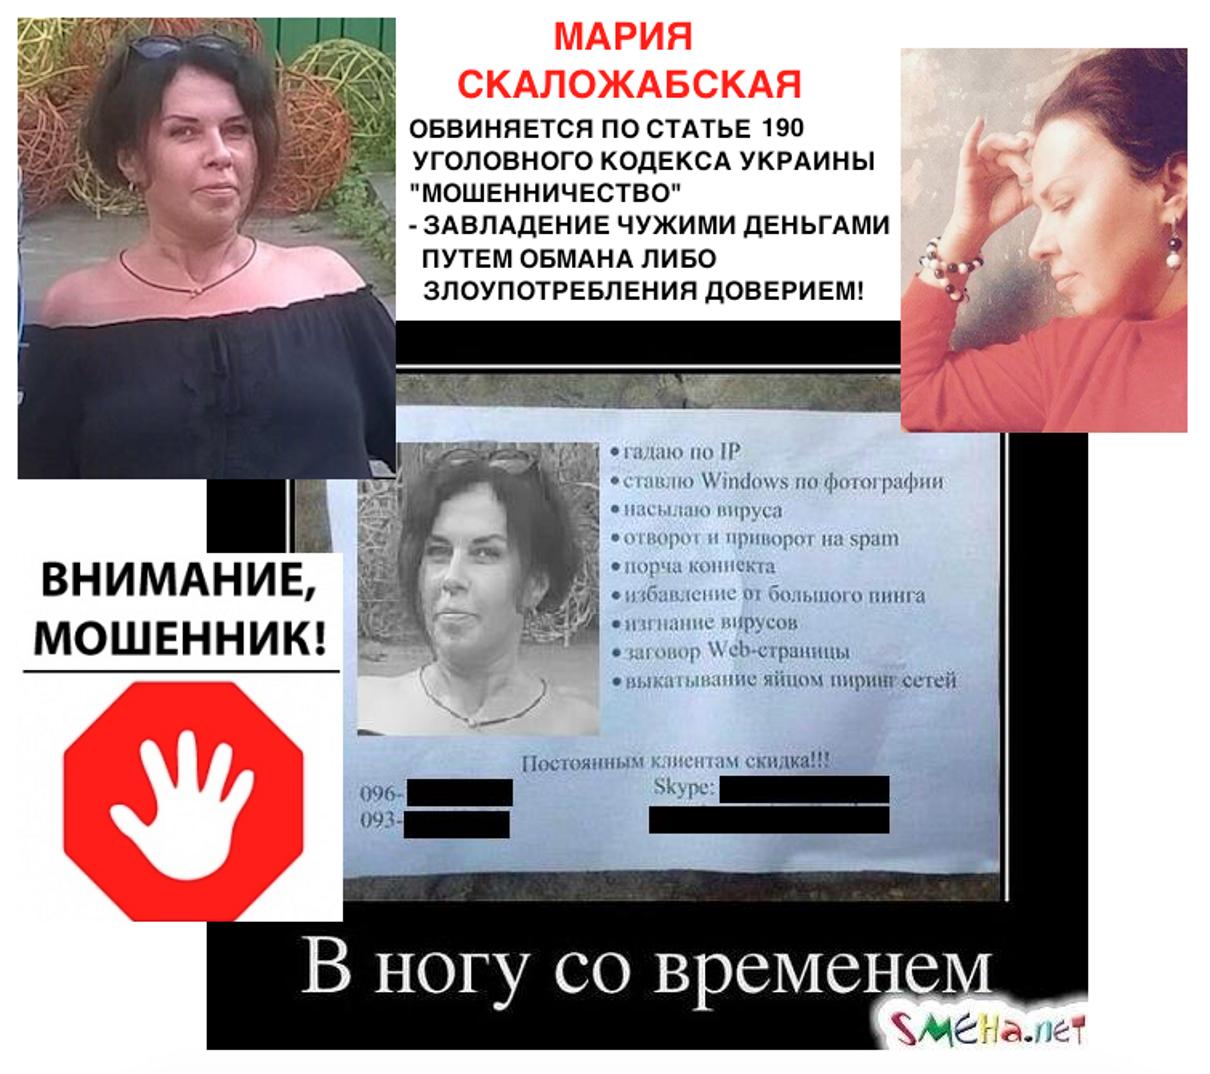 Жалоба-отзыв: Мария Скаложабская - Мария Скаложабская мошенница